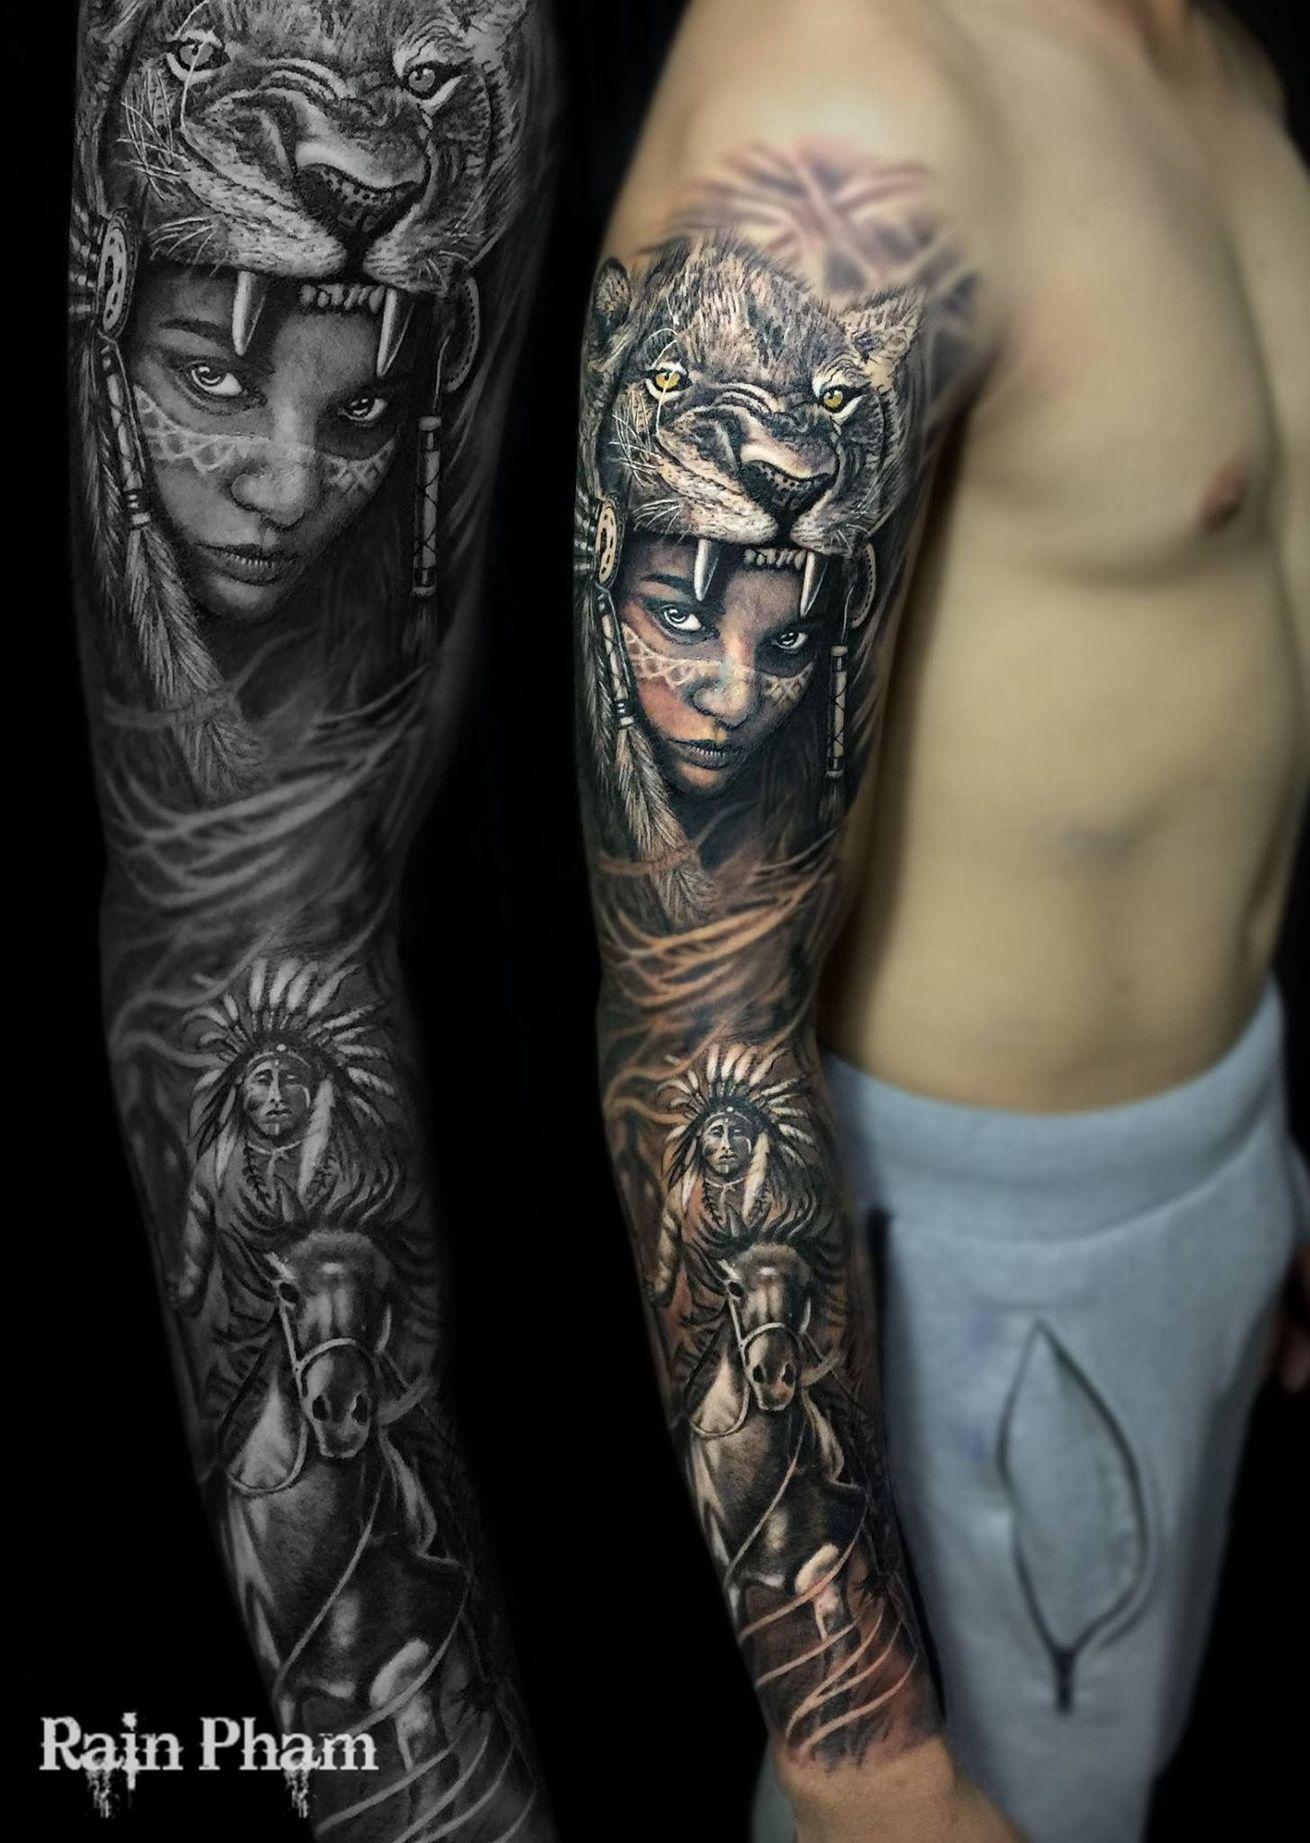 e74485438d1c8 Native indian tattoo sleeve 215 | tattoo | Native indian tattoos ...